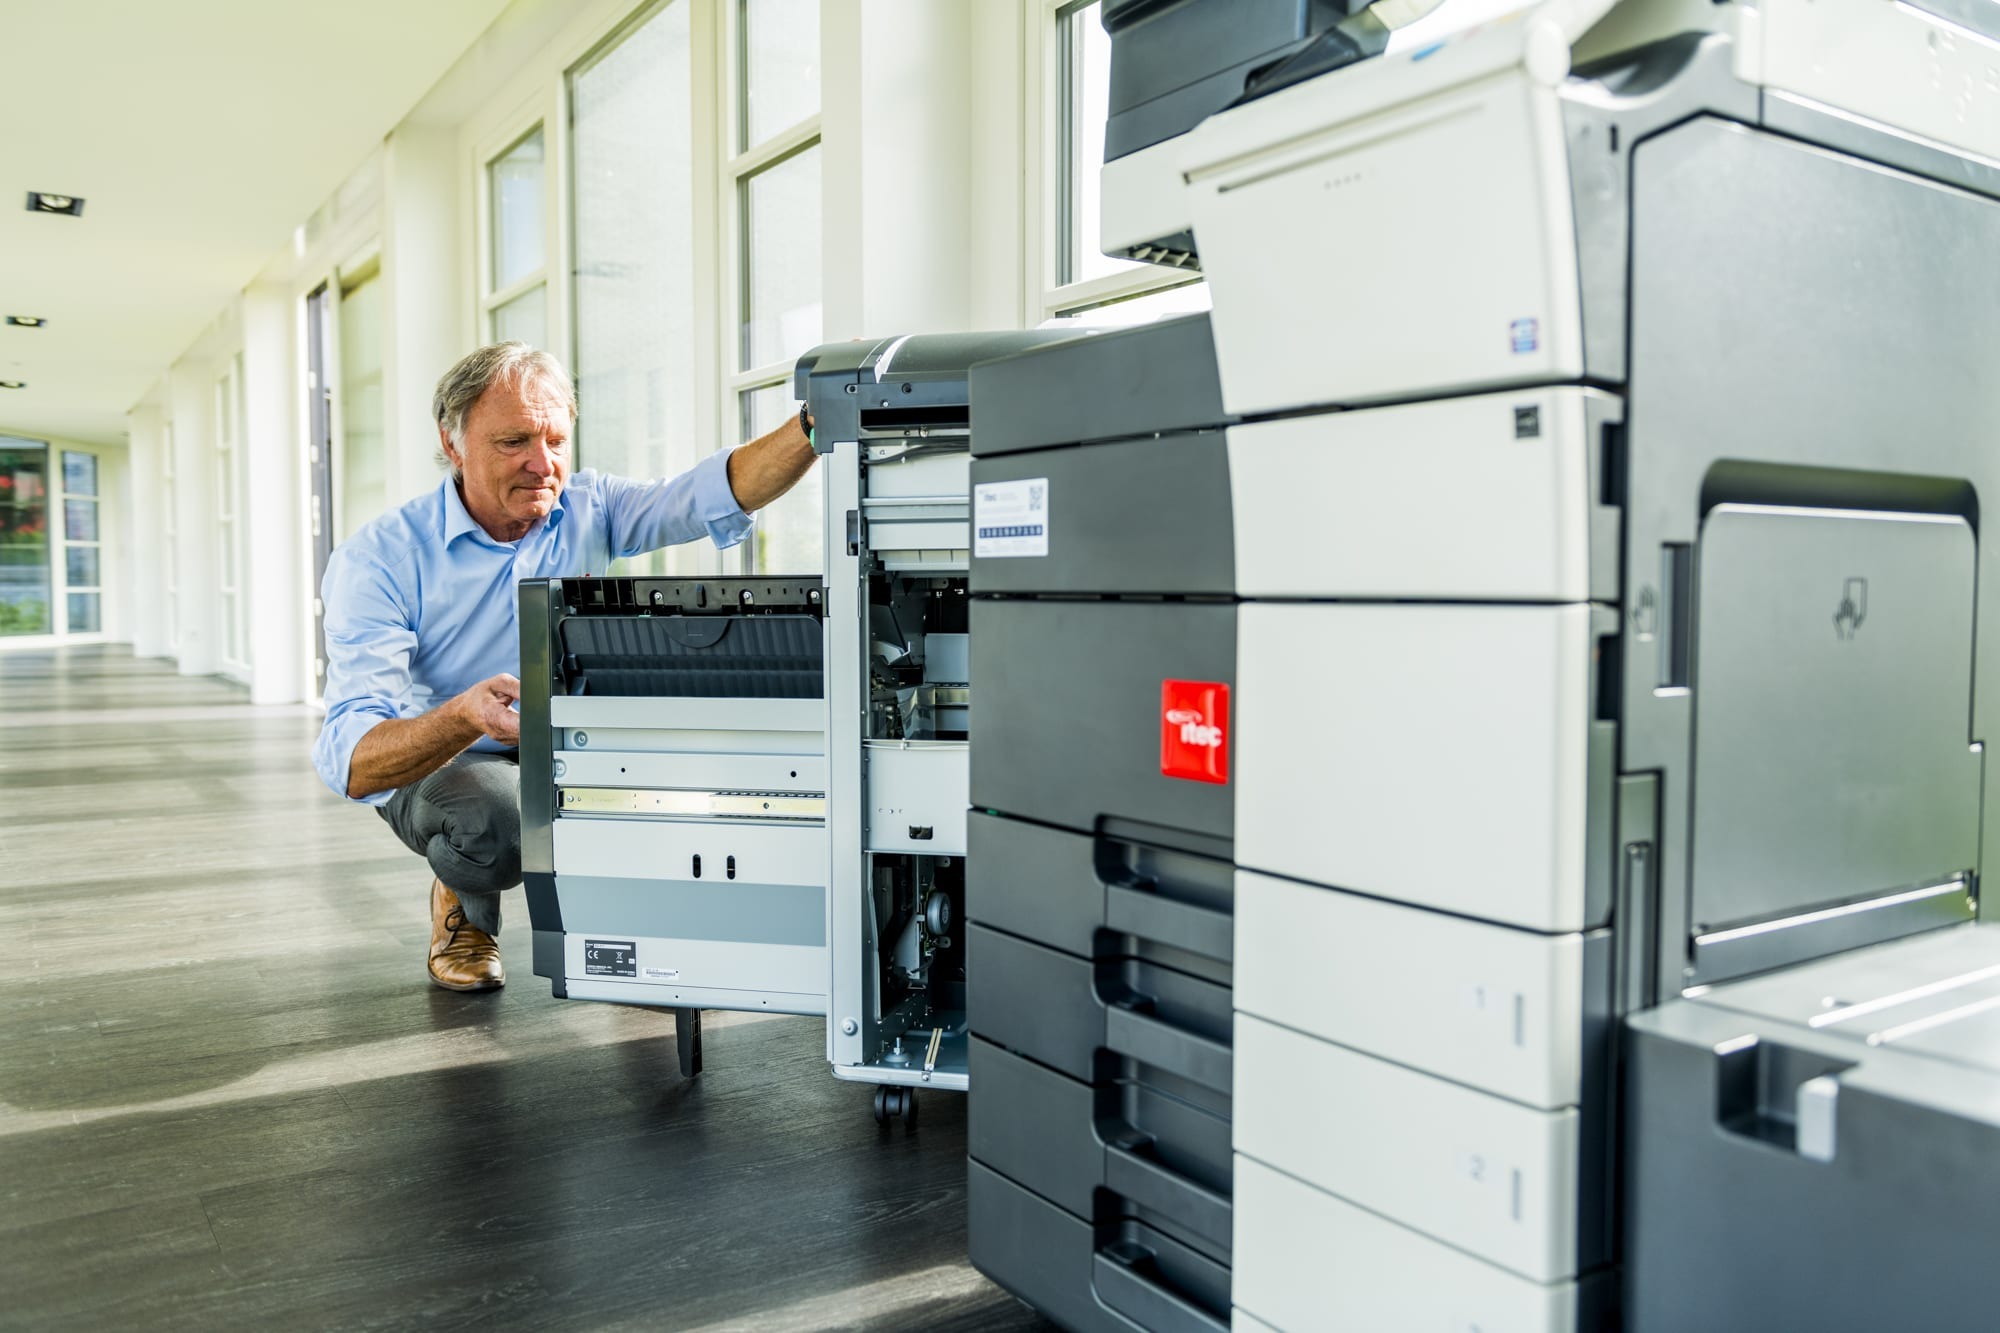 Itec Printer